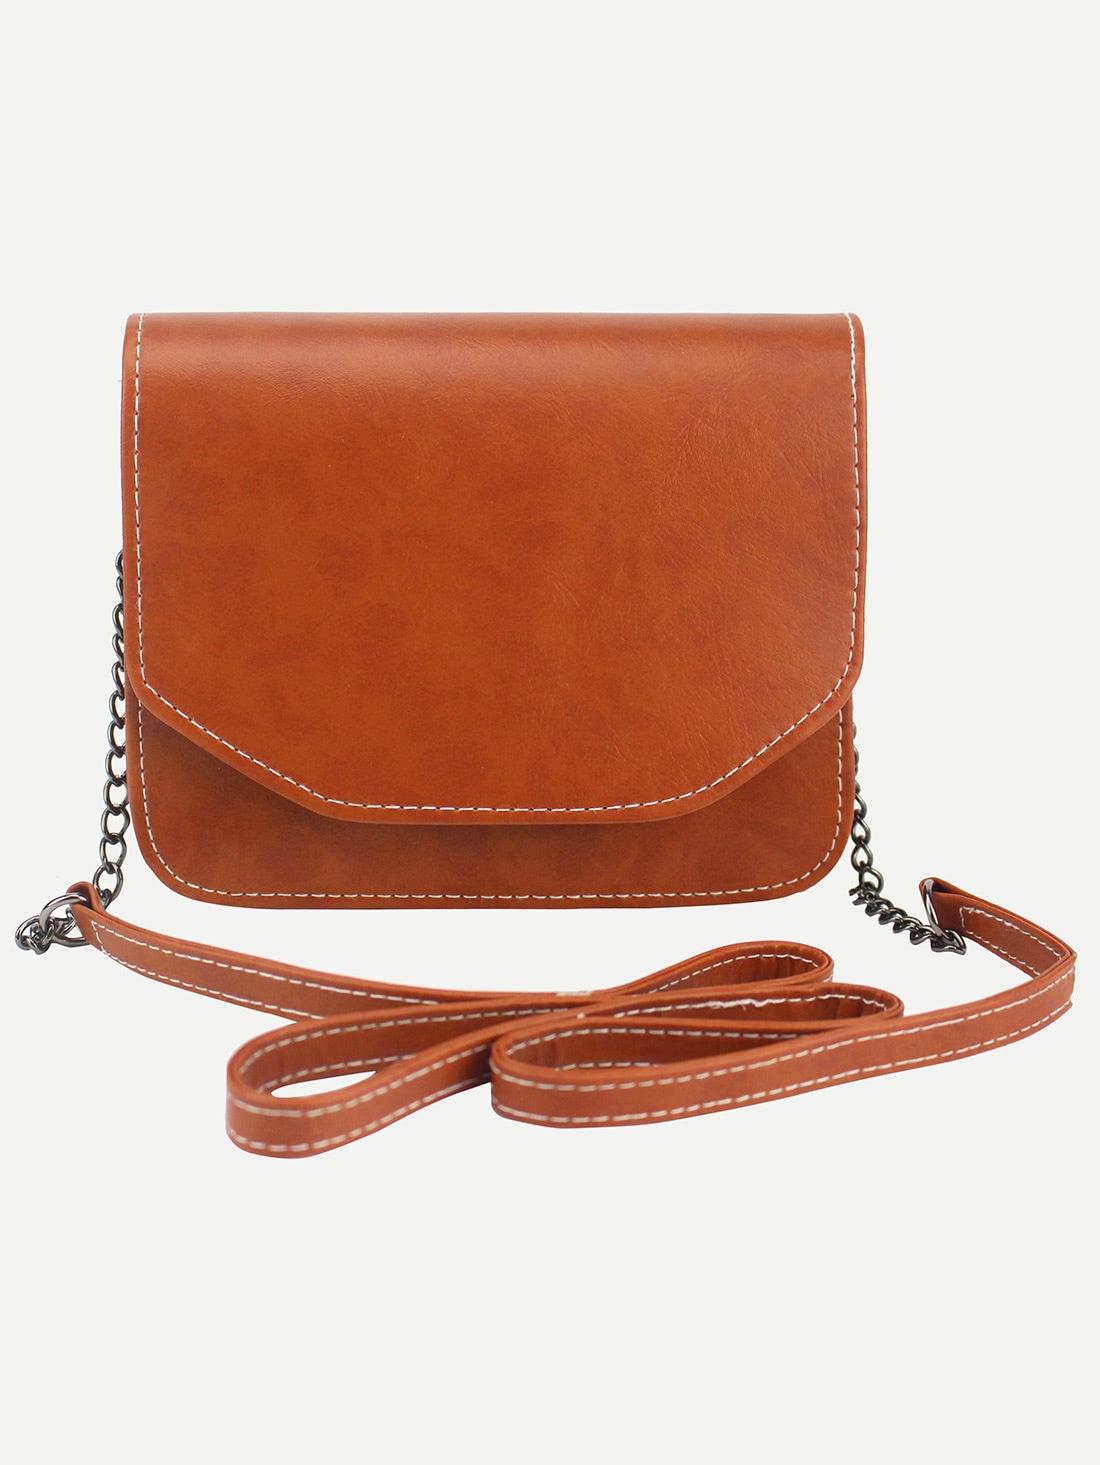 Distressed Hidden Button Flap Chain Bag